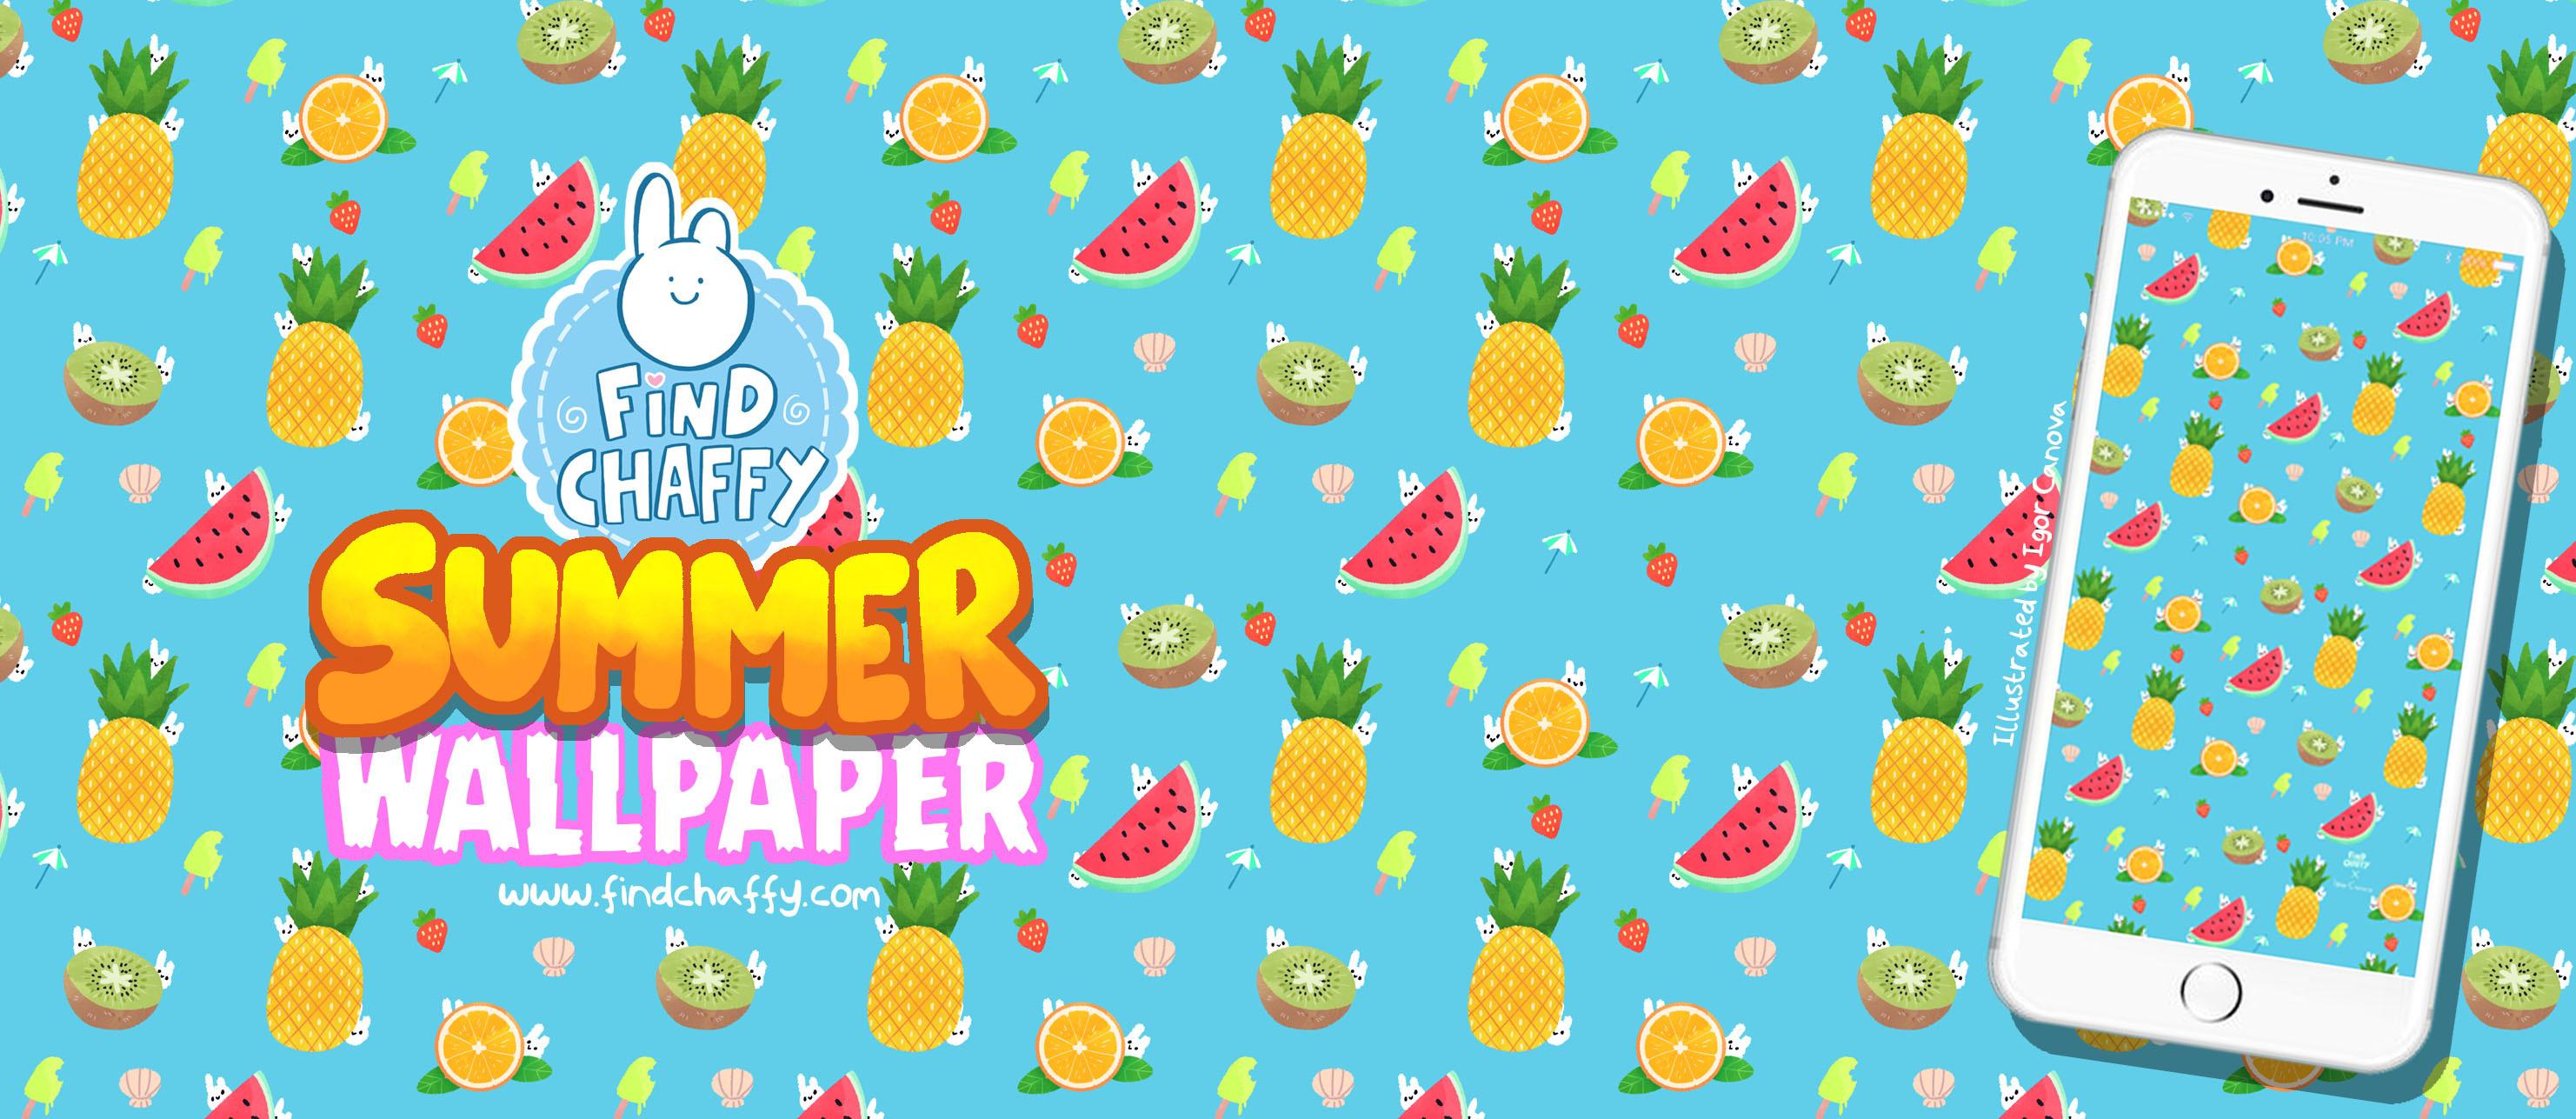 Find Chaffy – Summer wallpaper!